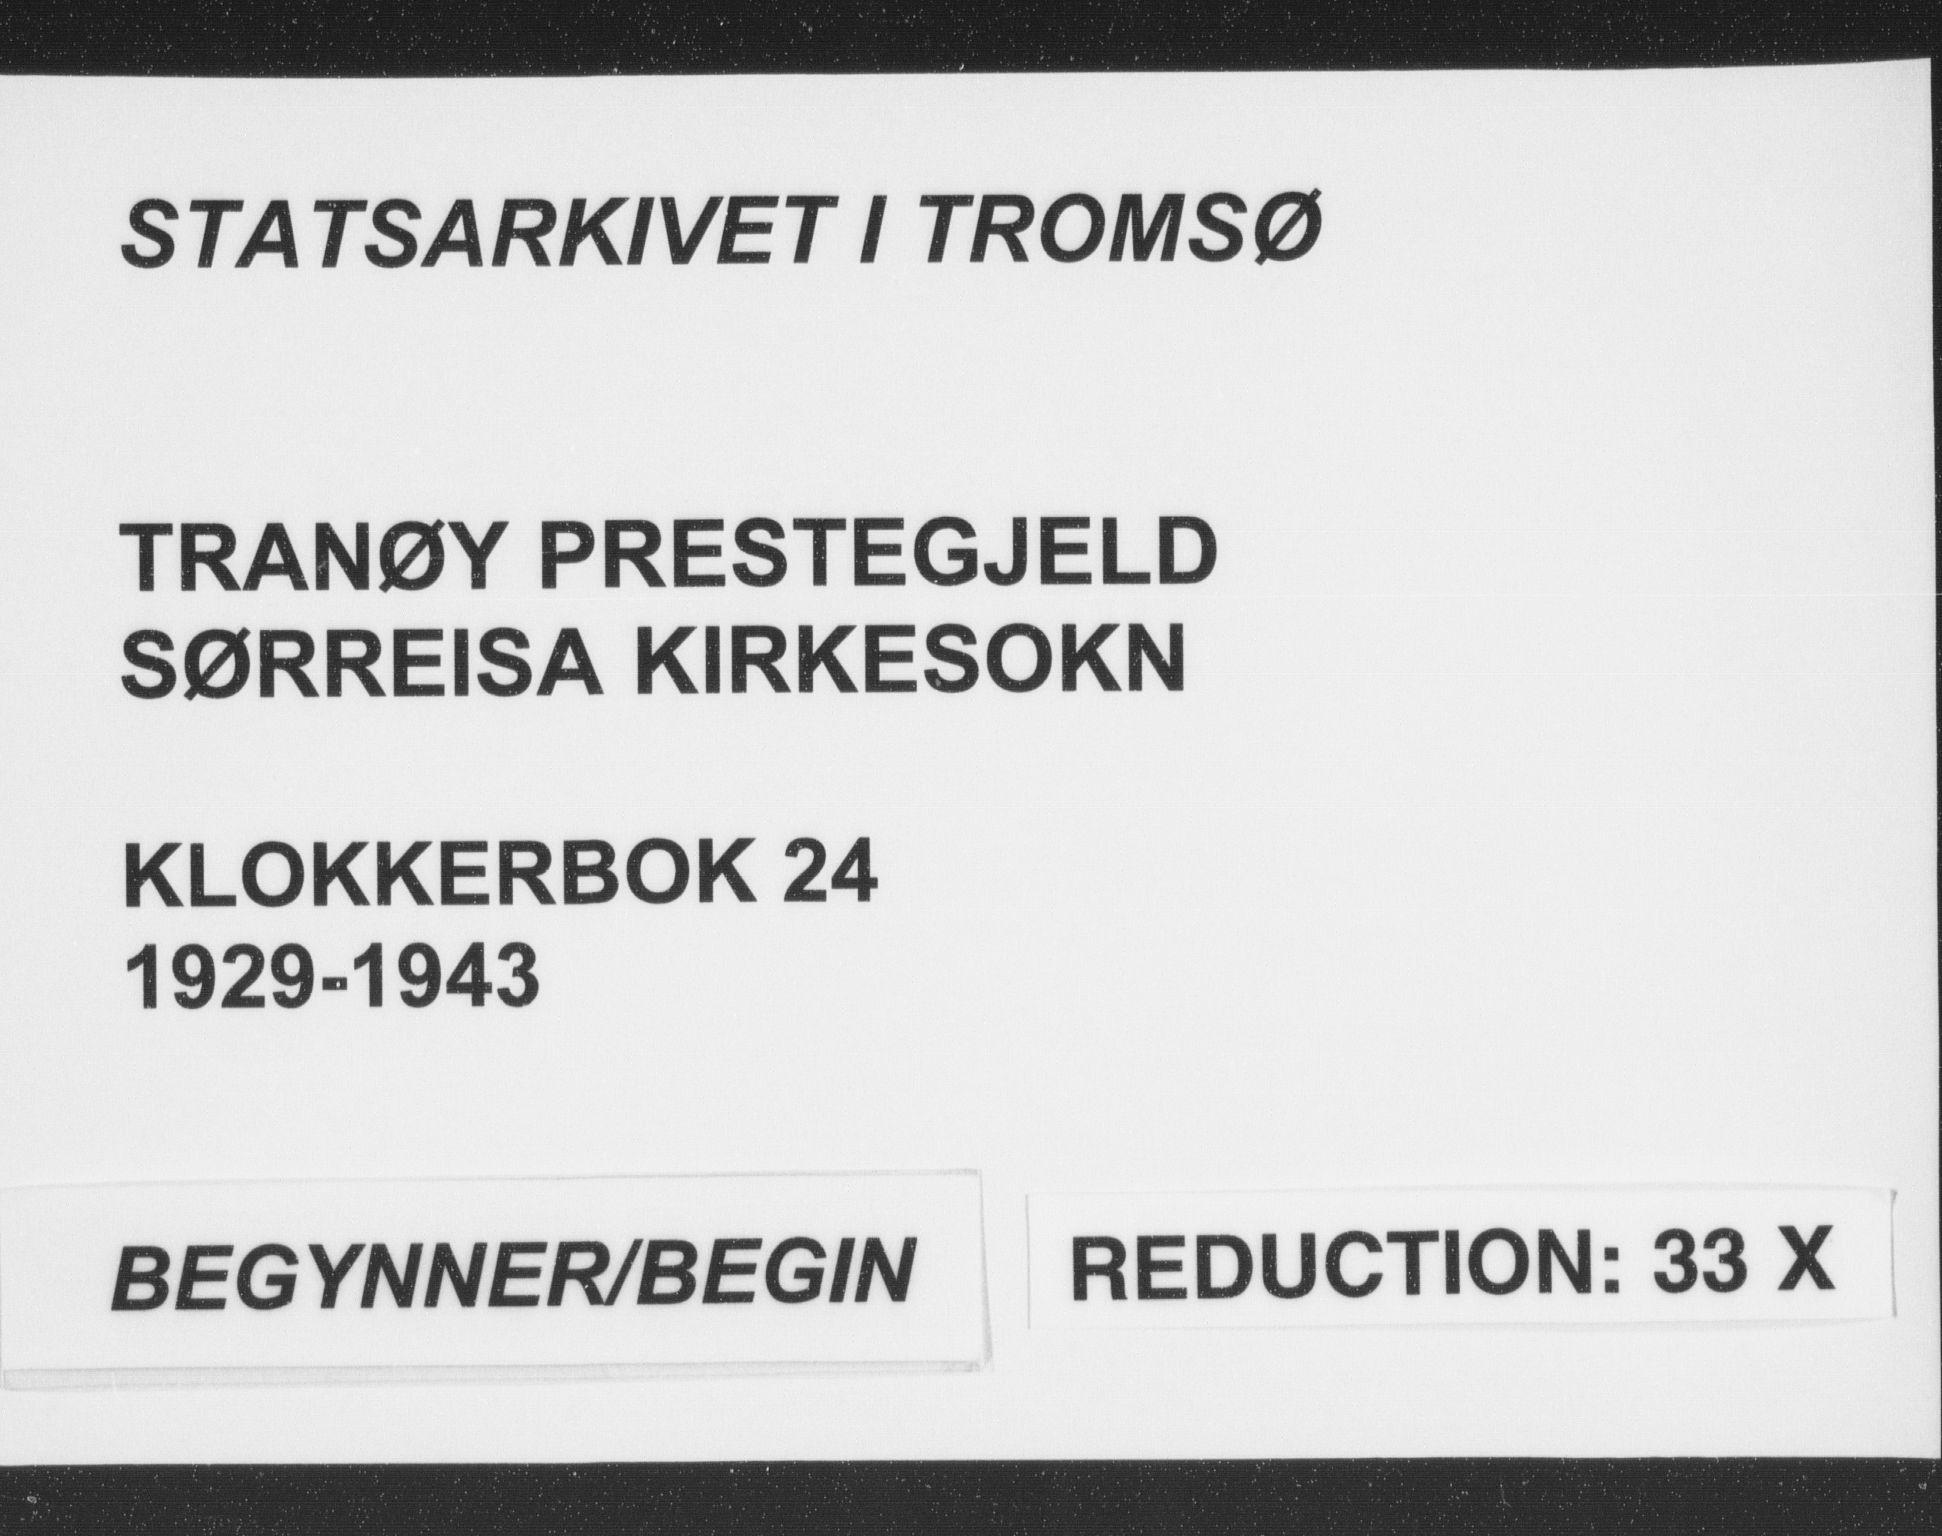 SATØ, Tranøy sokneprestkontor, I/Ia/Iab/L0024klokker: Klokkerbok nr. 24, 1929-1943